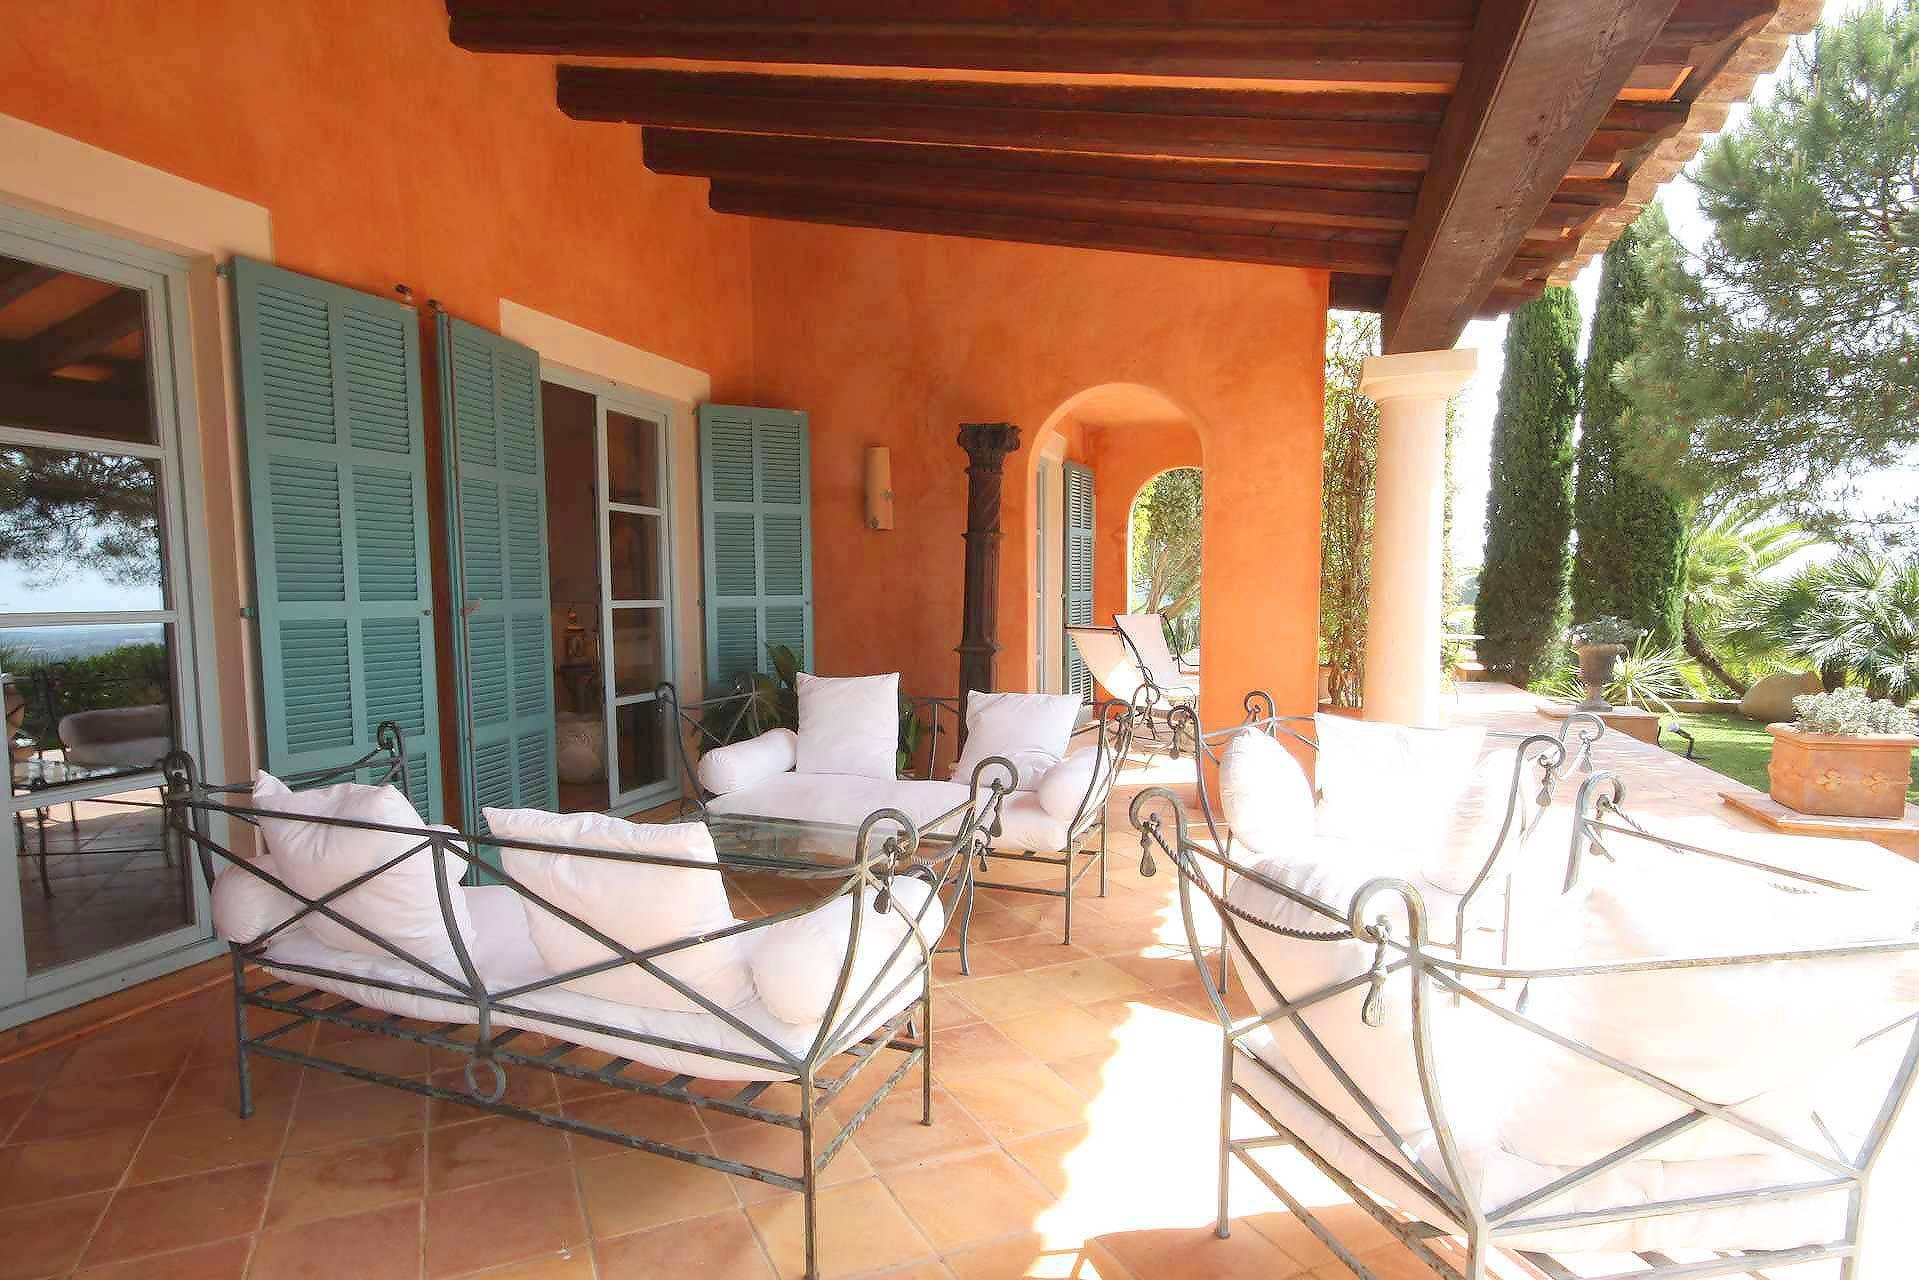 01-98 Extravagantes Ferienhaus Mallorca Osten Bild 12